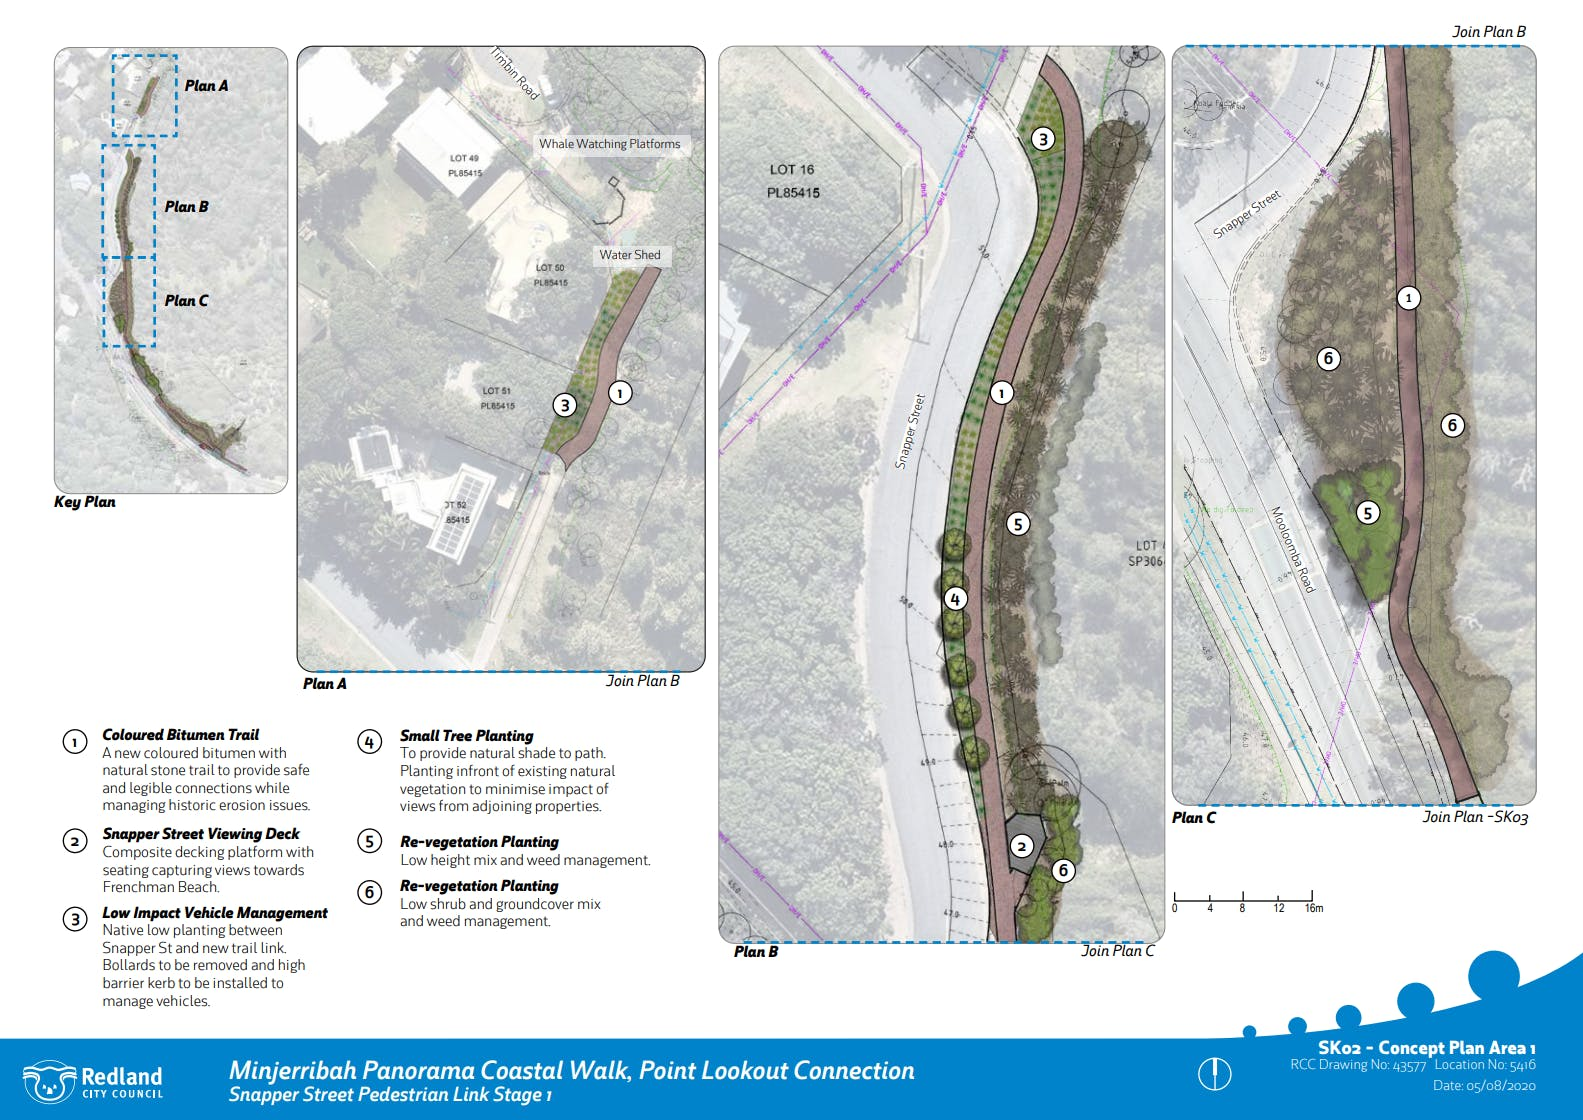 Concept Plan Area 1